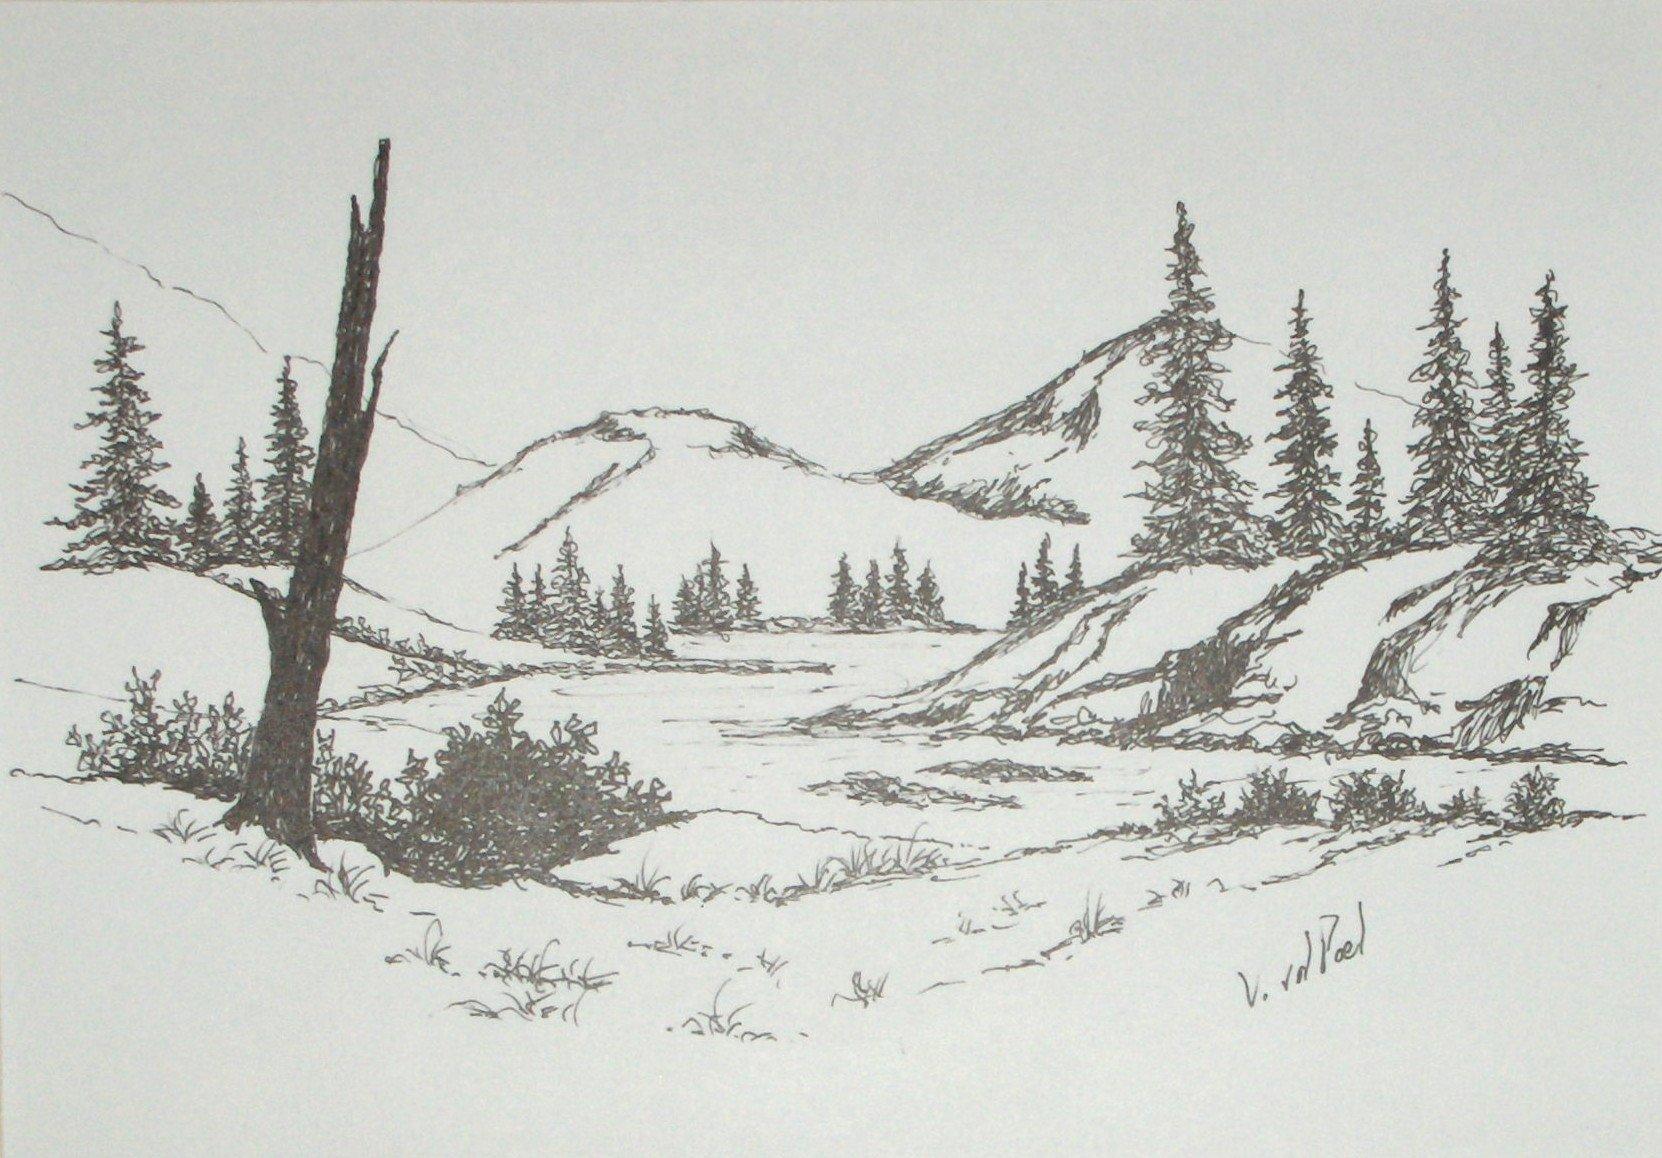 Drawn river pen Original Scene an an original